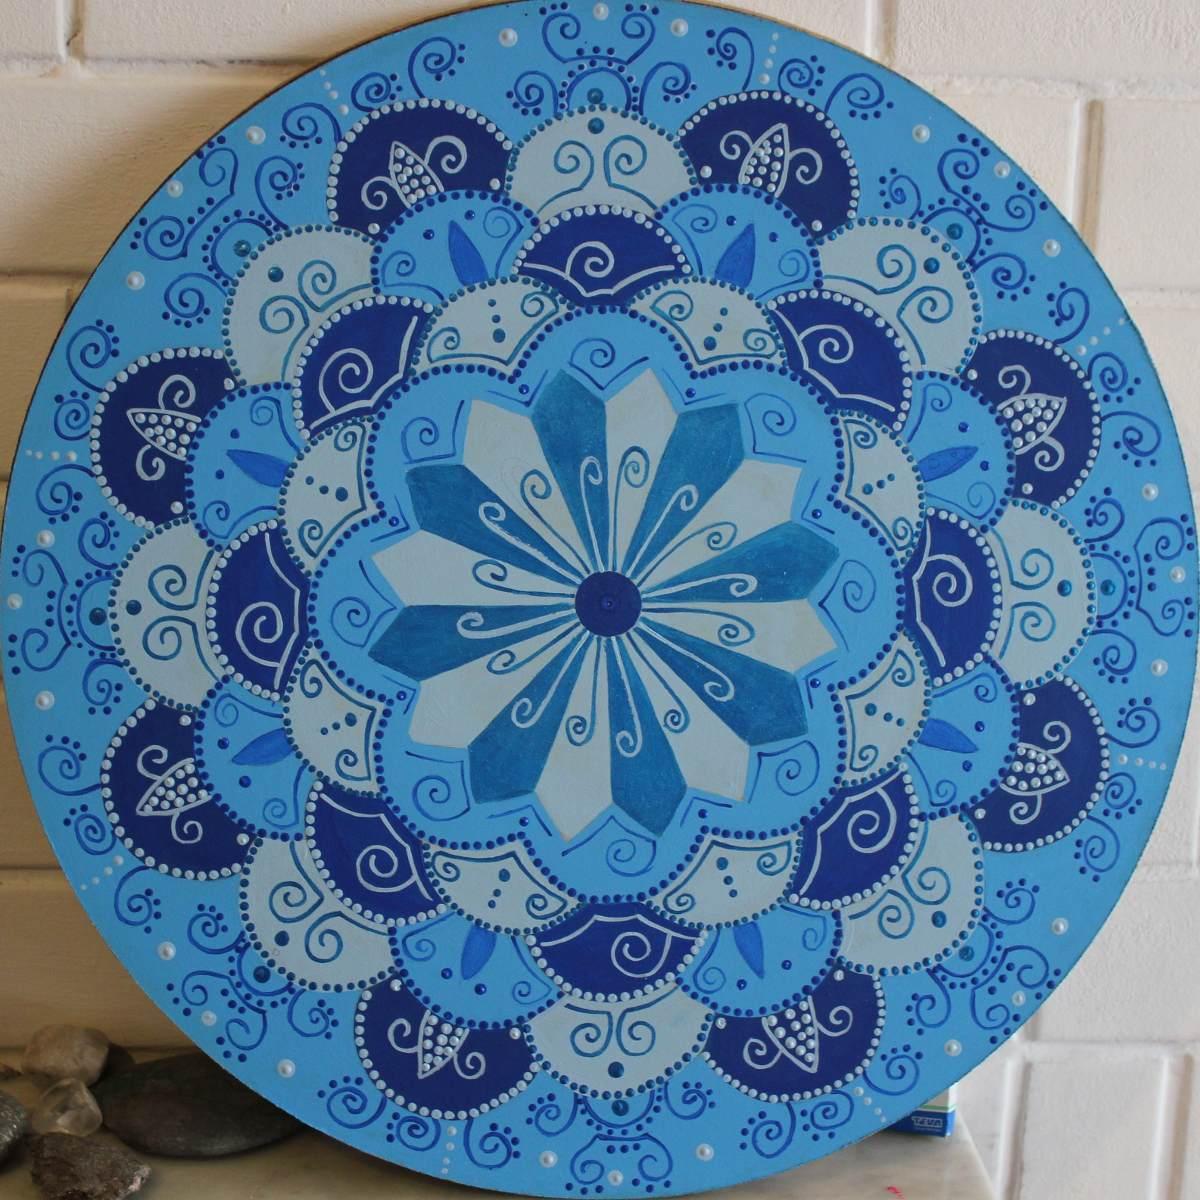 Mandalas Pintados Para Imprimir Mandalas Geomtricos Para Imprimir Y